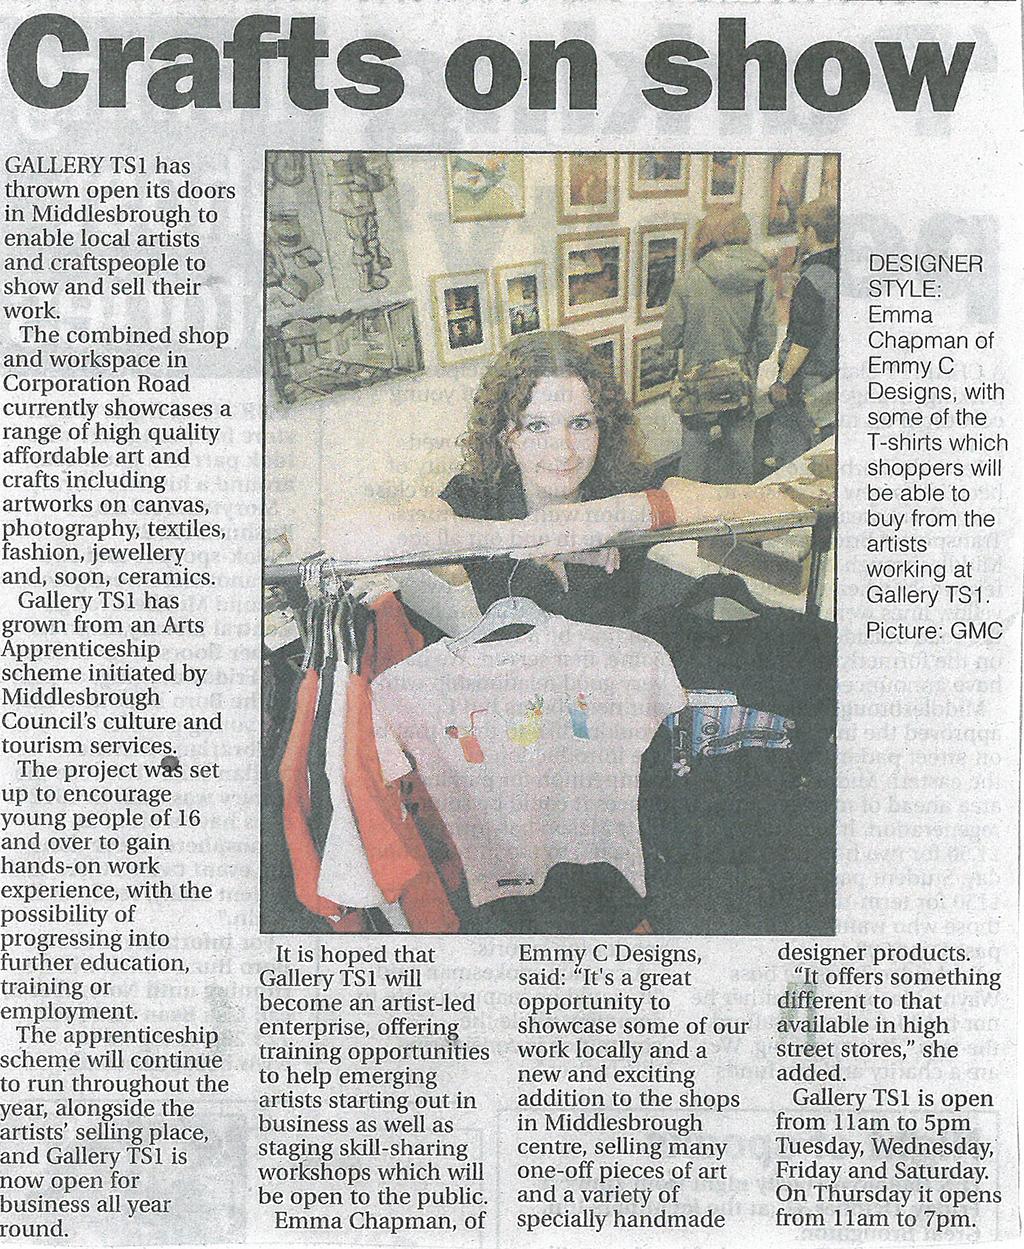 2008-10-30, Herald & Post